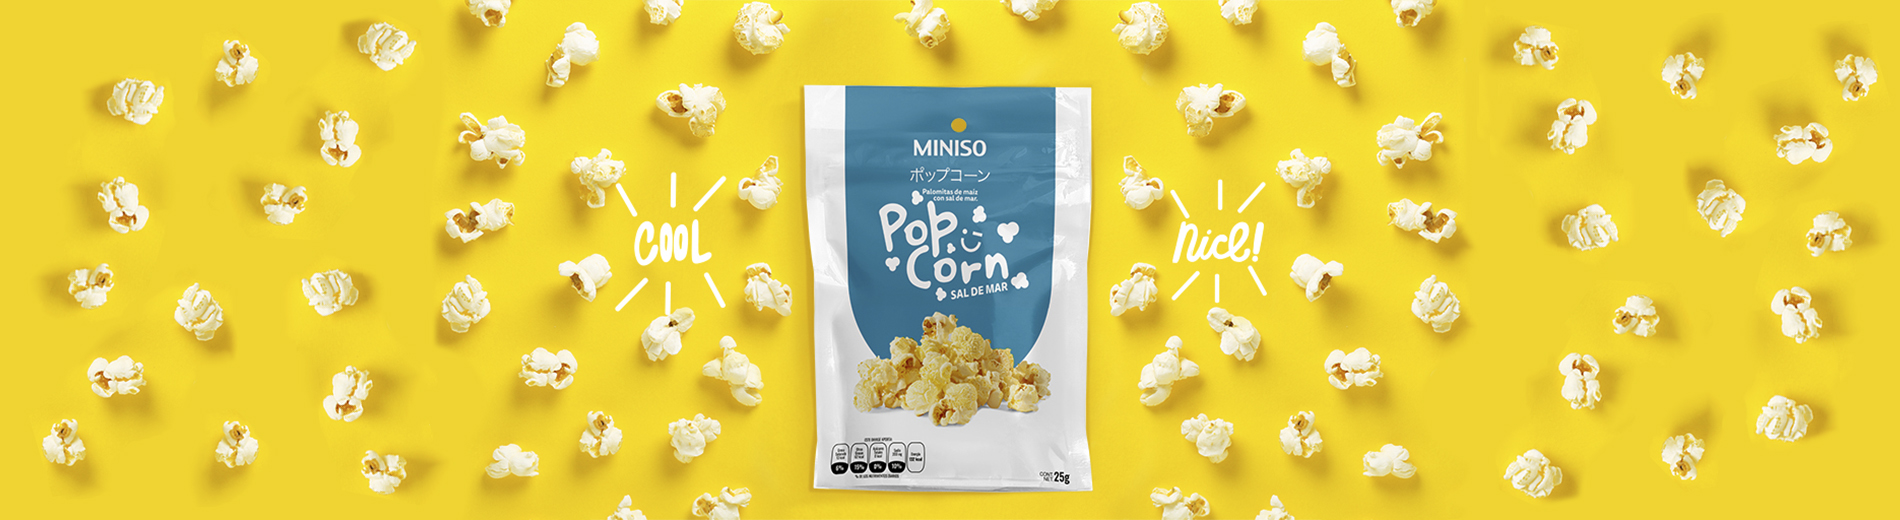 snacksMiniso